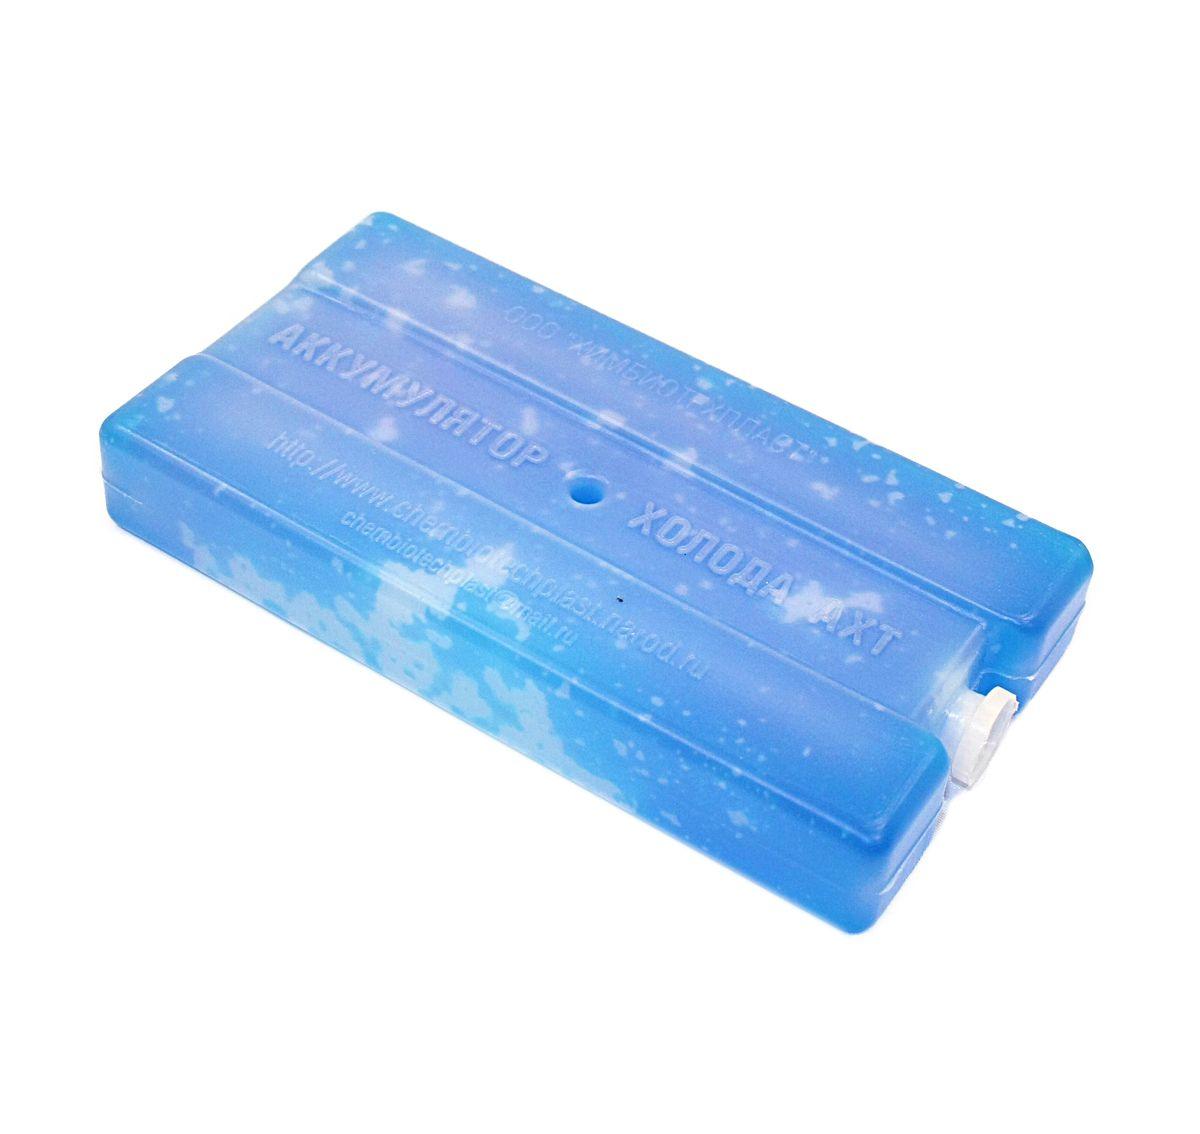 Аккумулятор холода Eva, гелевый, 500 г термосумки thermos аккумулятор холода medium size freezing board 400 г